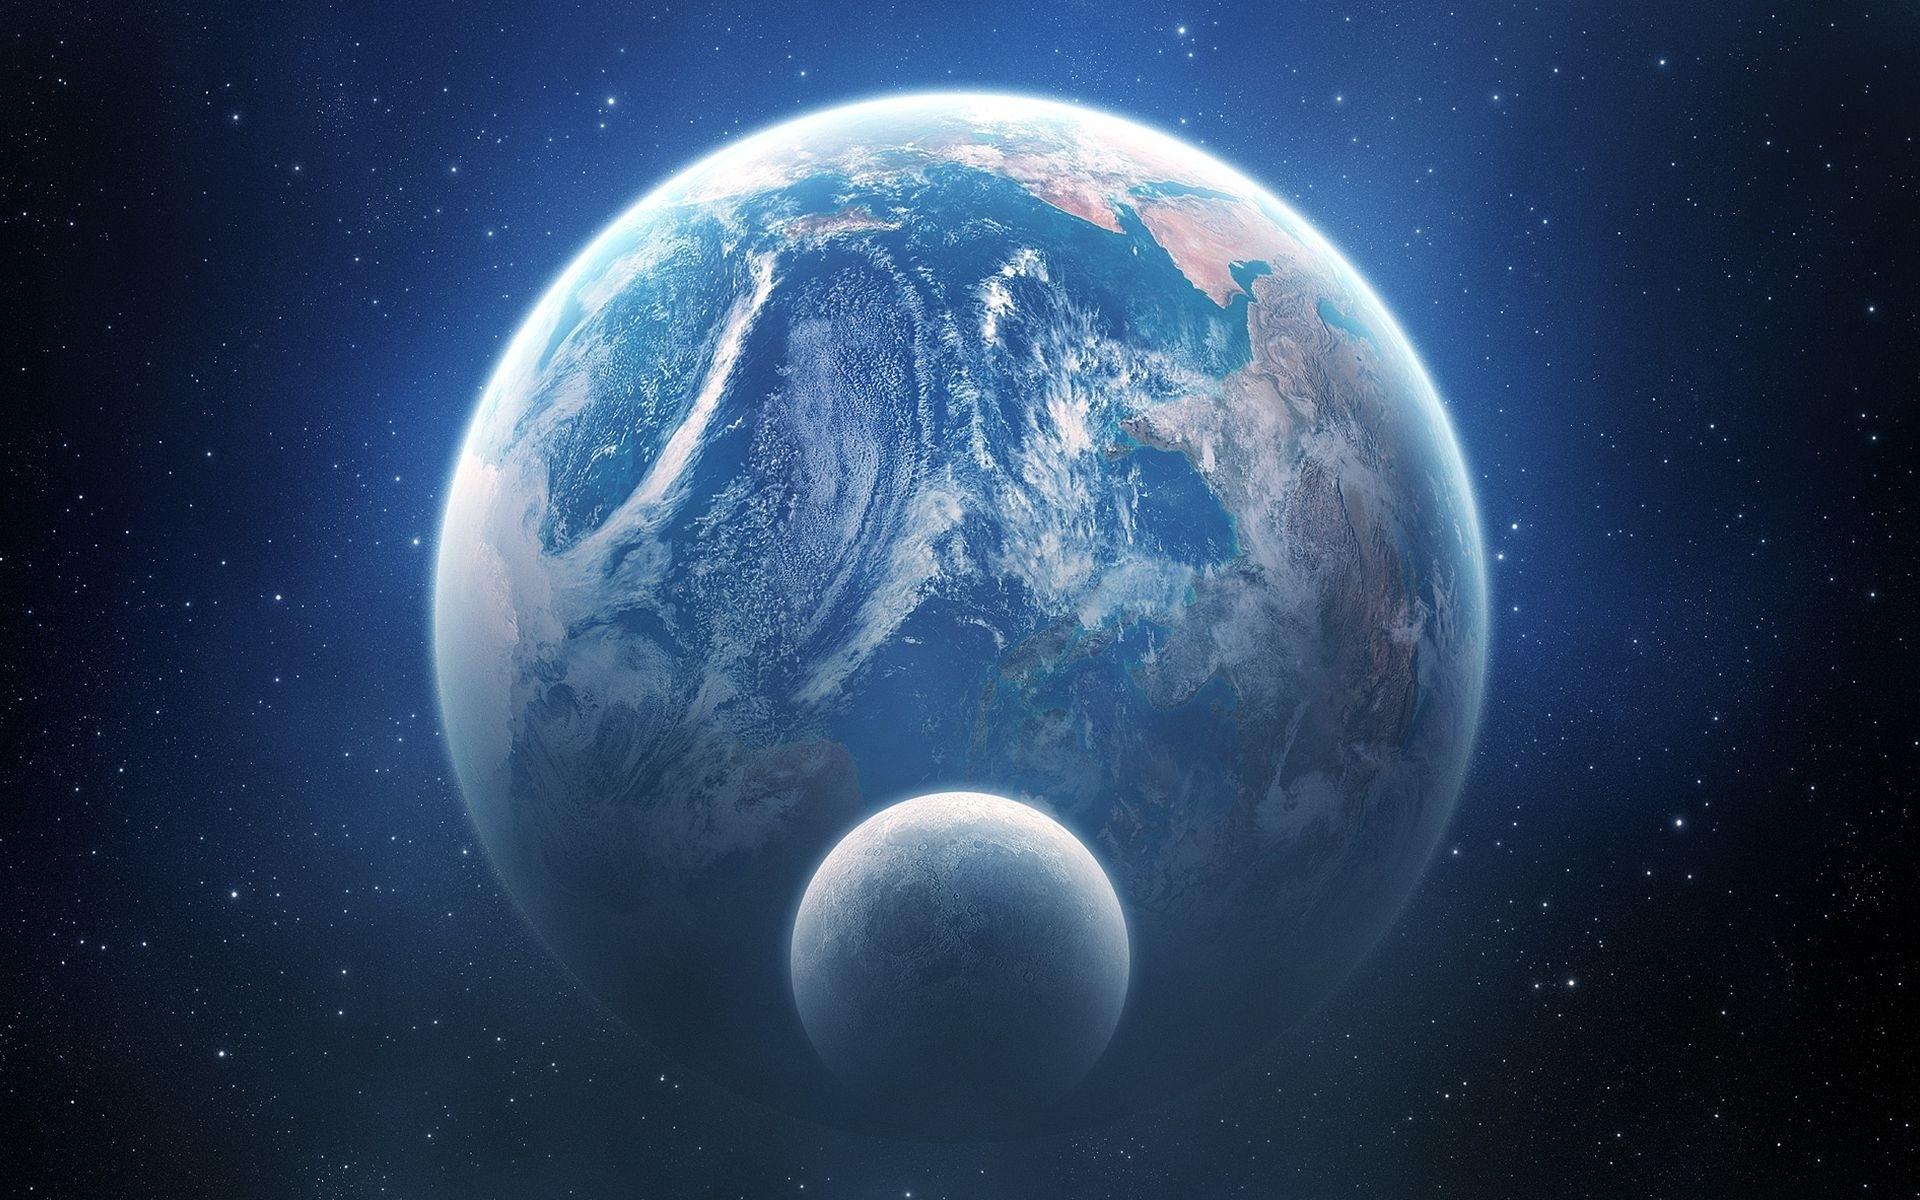 General 1920x1200 space planet Moon space art Earth digital art DeviantArt